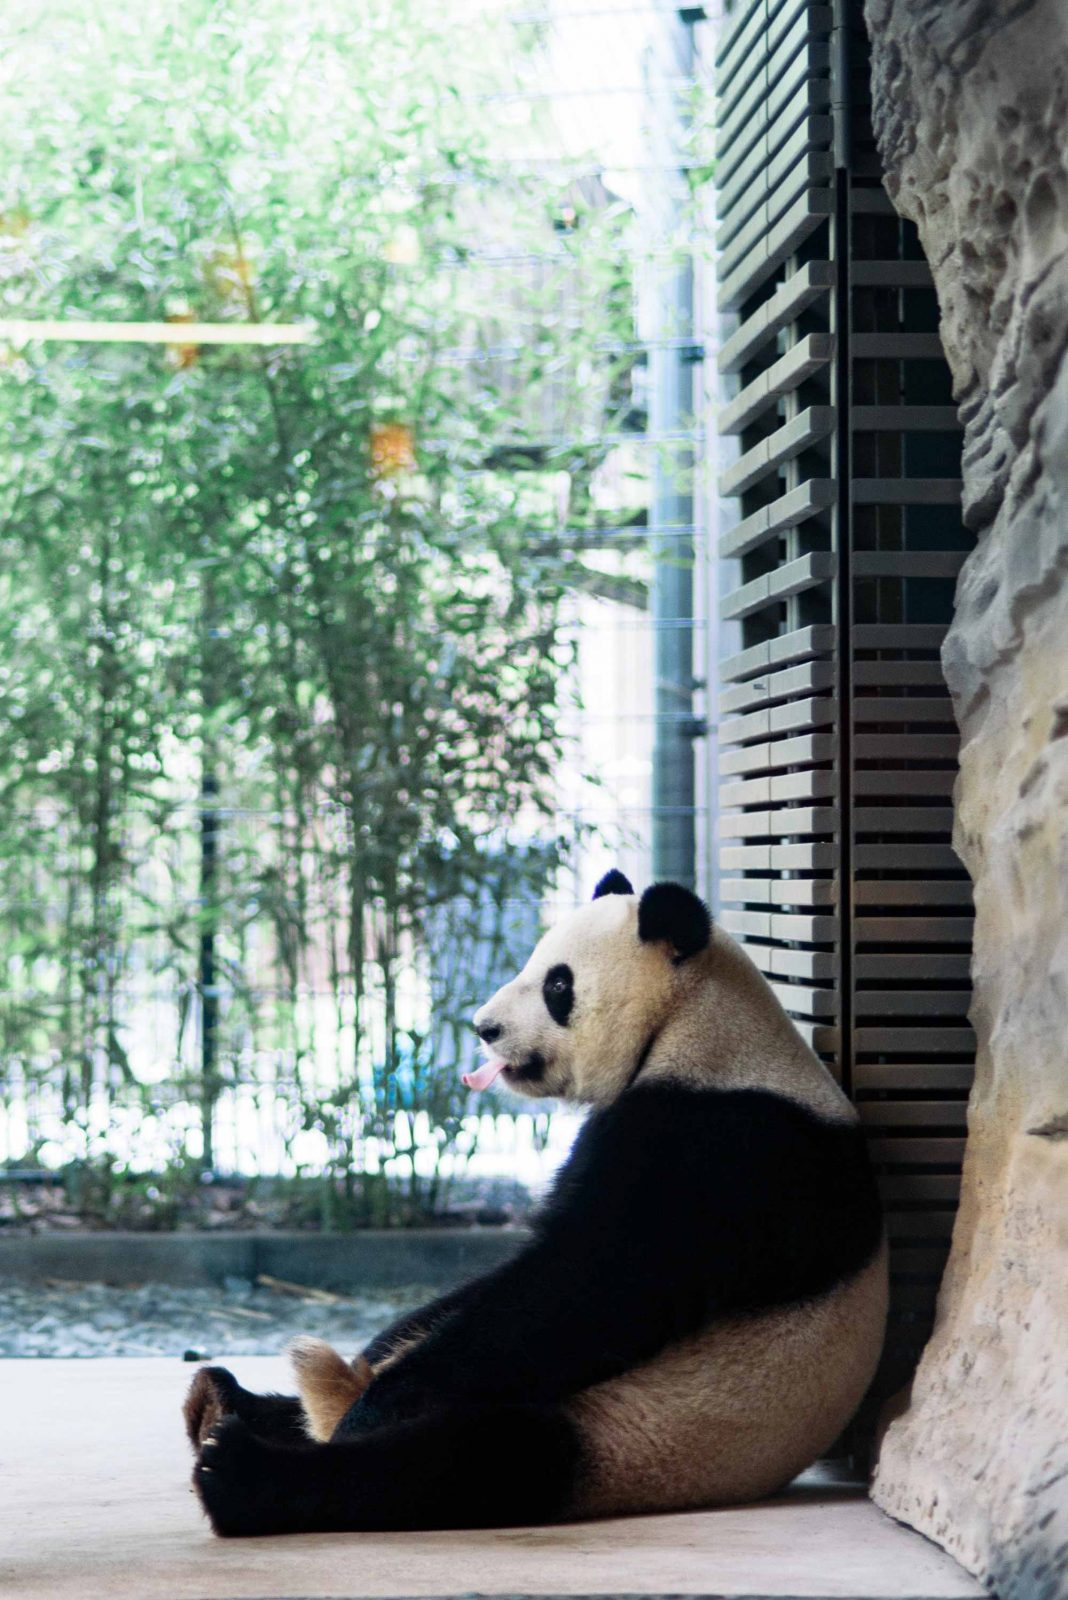 One of Berlin's panda bears.